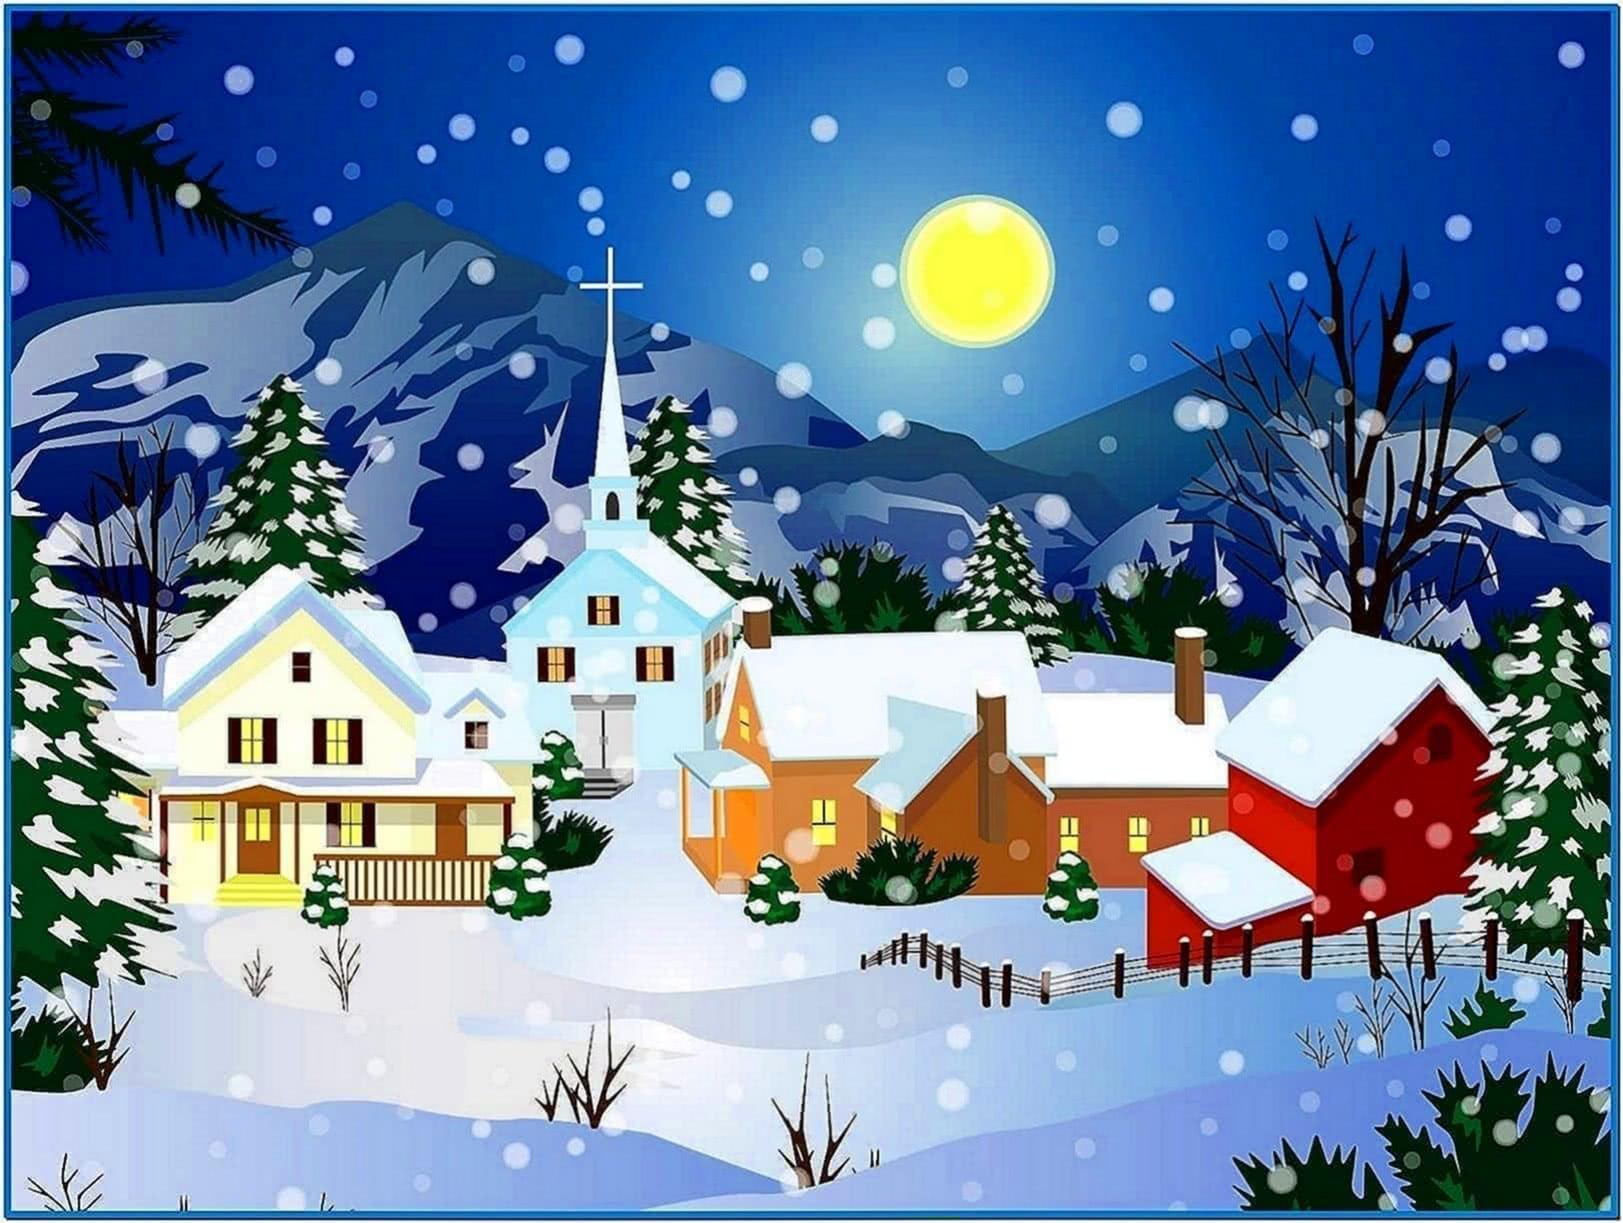 Animated Christmas Desktop Screensavers